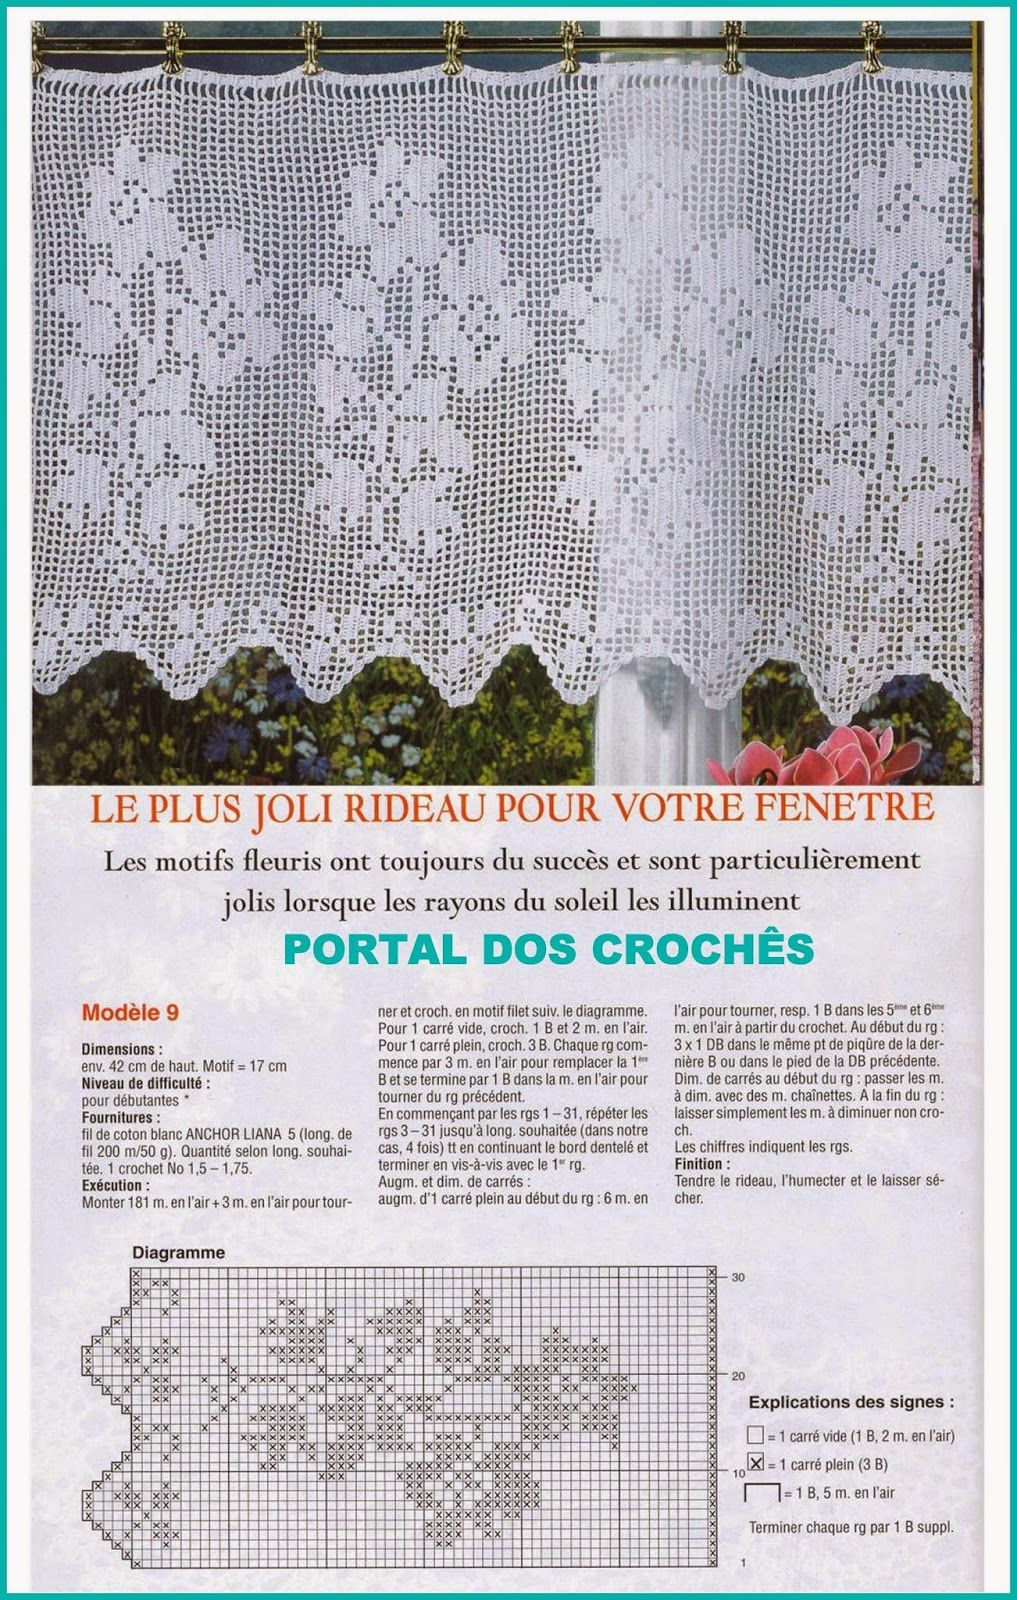 PORTAL DOS CROCHÊS: CORTINAS E BANDÔS DE CROCHÊ DE FILÉ | Crochet ...